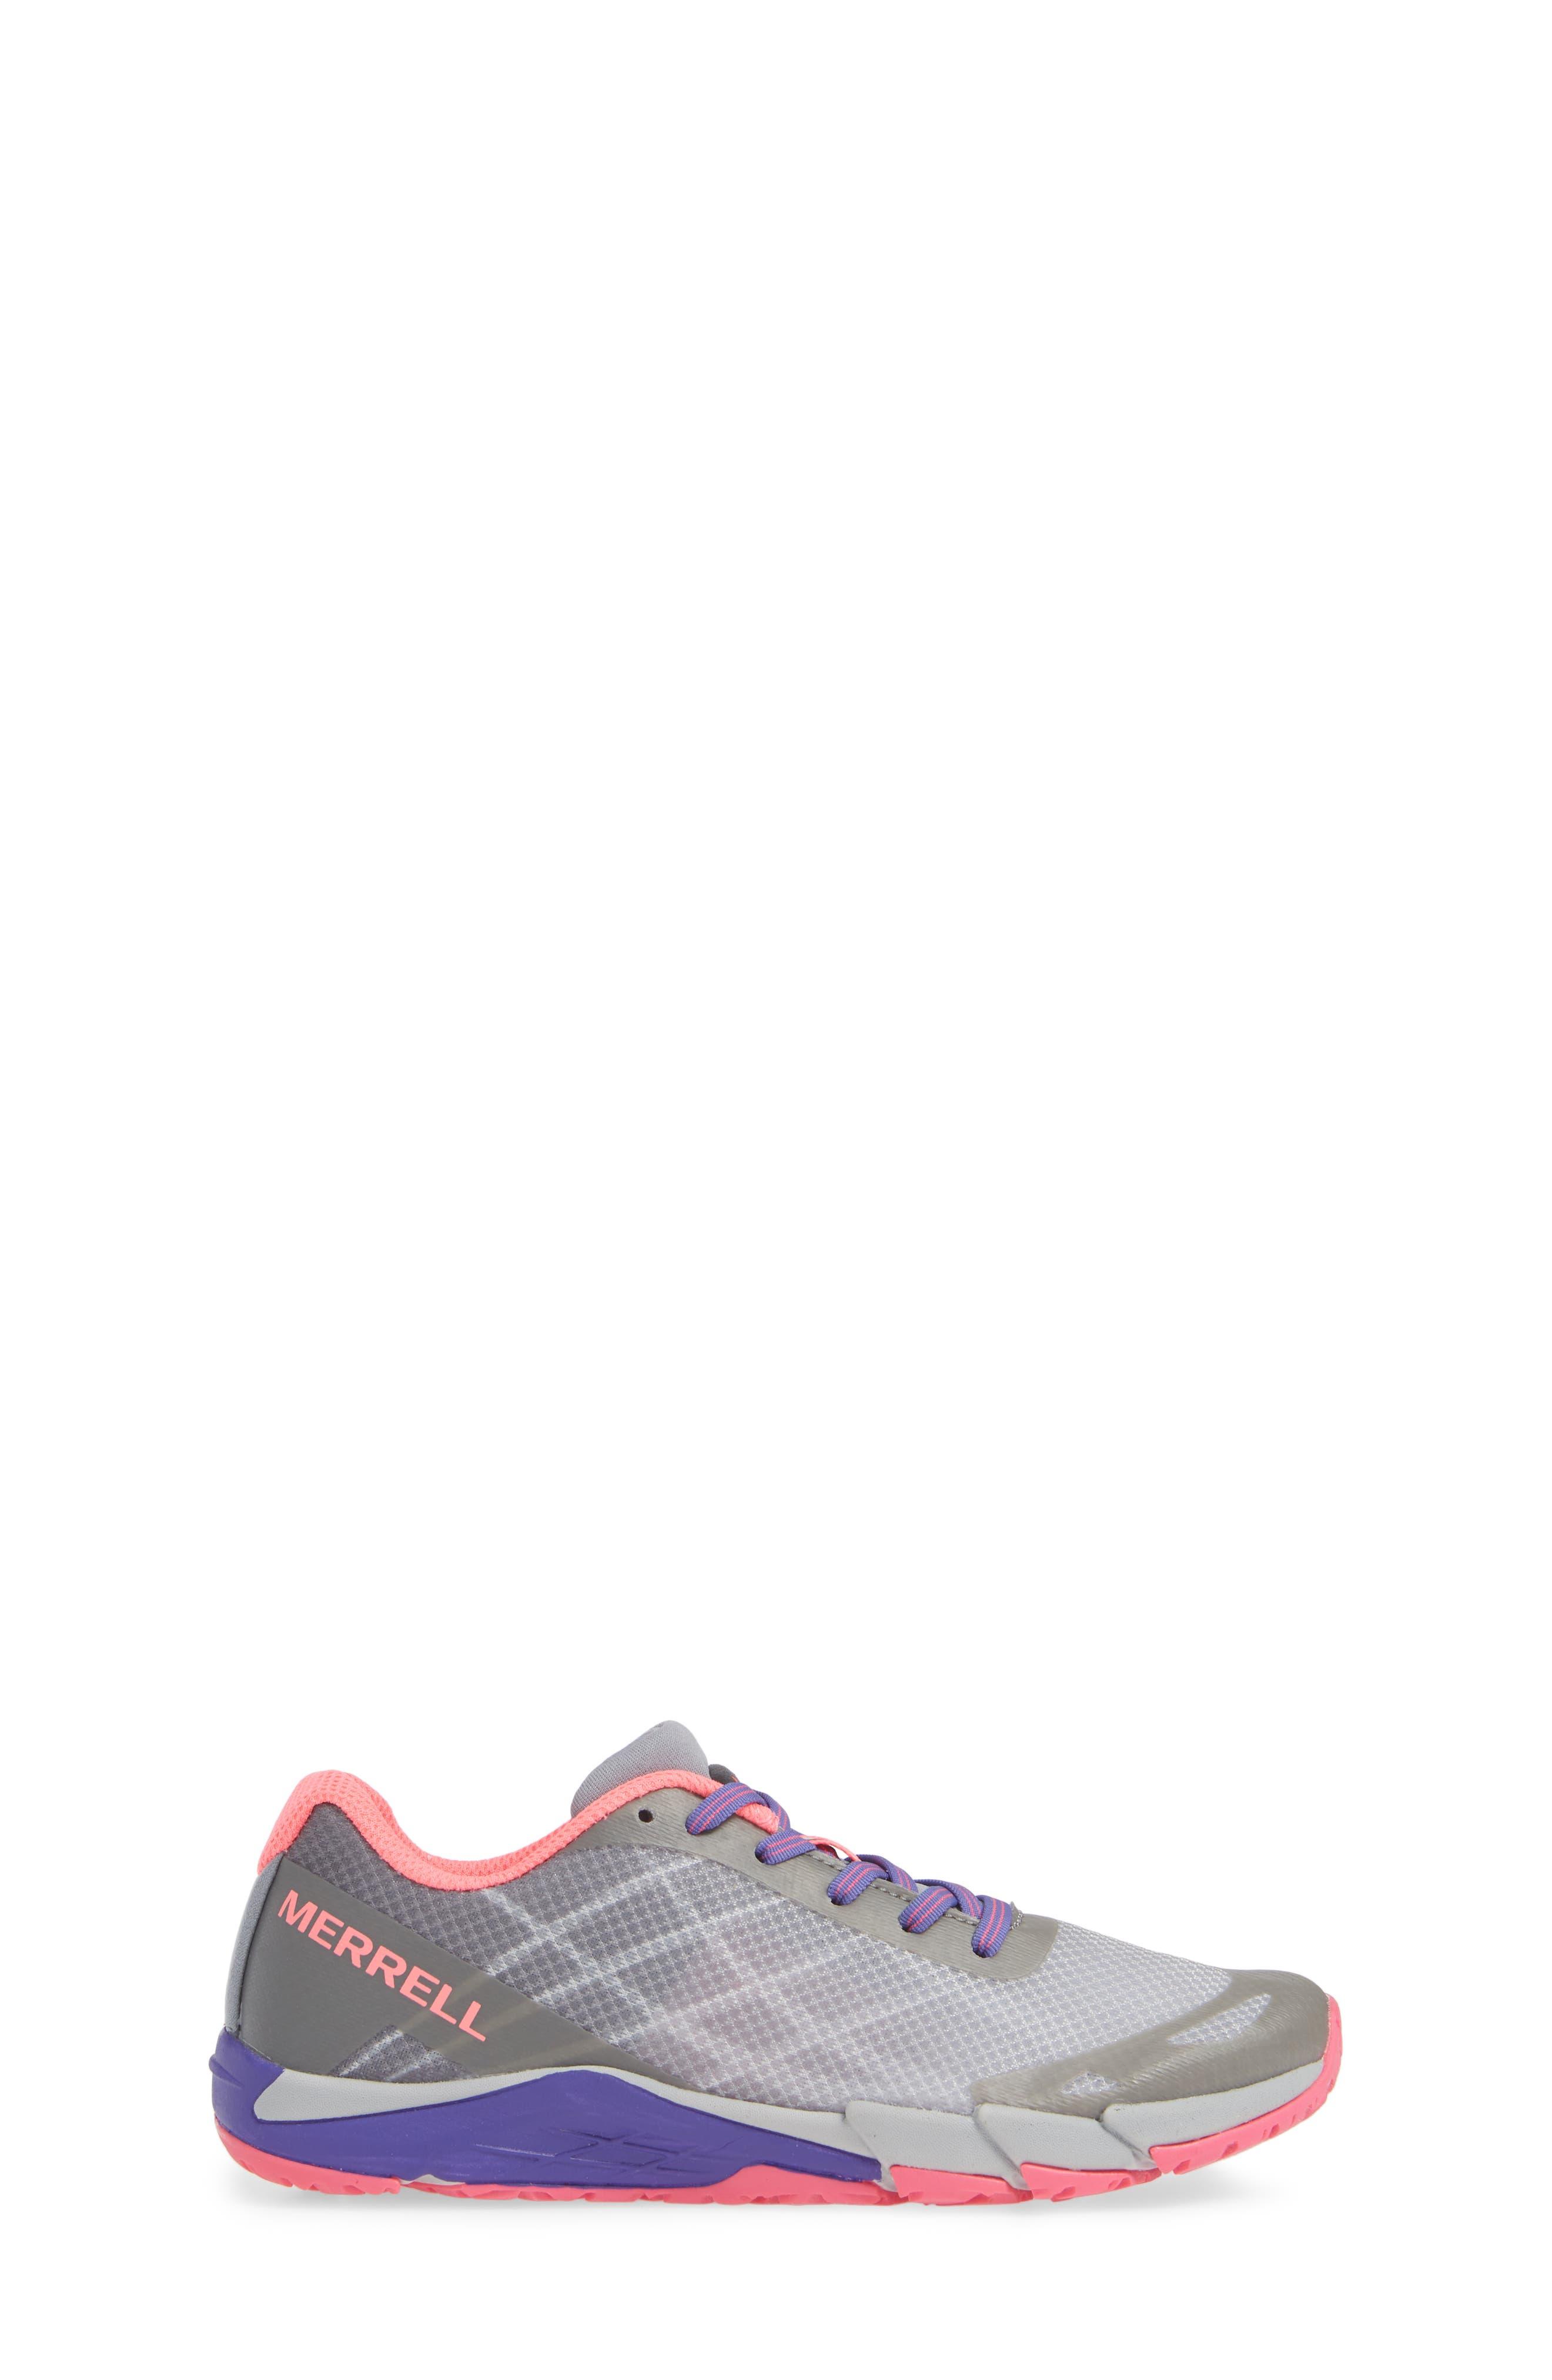 MERRELL, Bare Access Sneaker, Alternate thumbnail 3, color, GREY/ MULTI SYNTHETIC